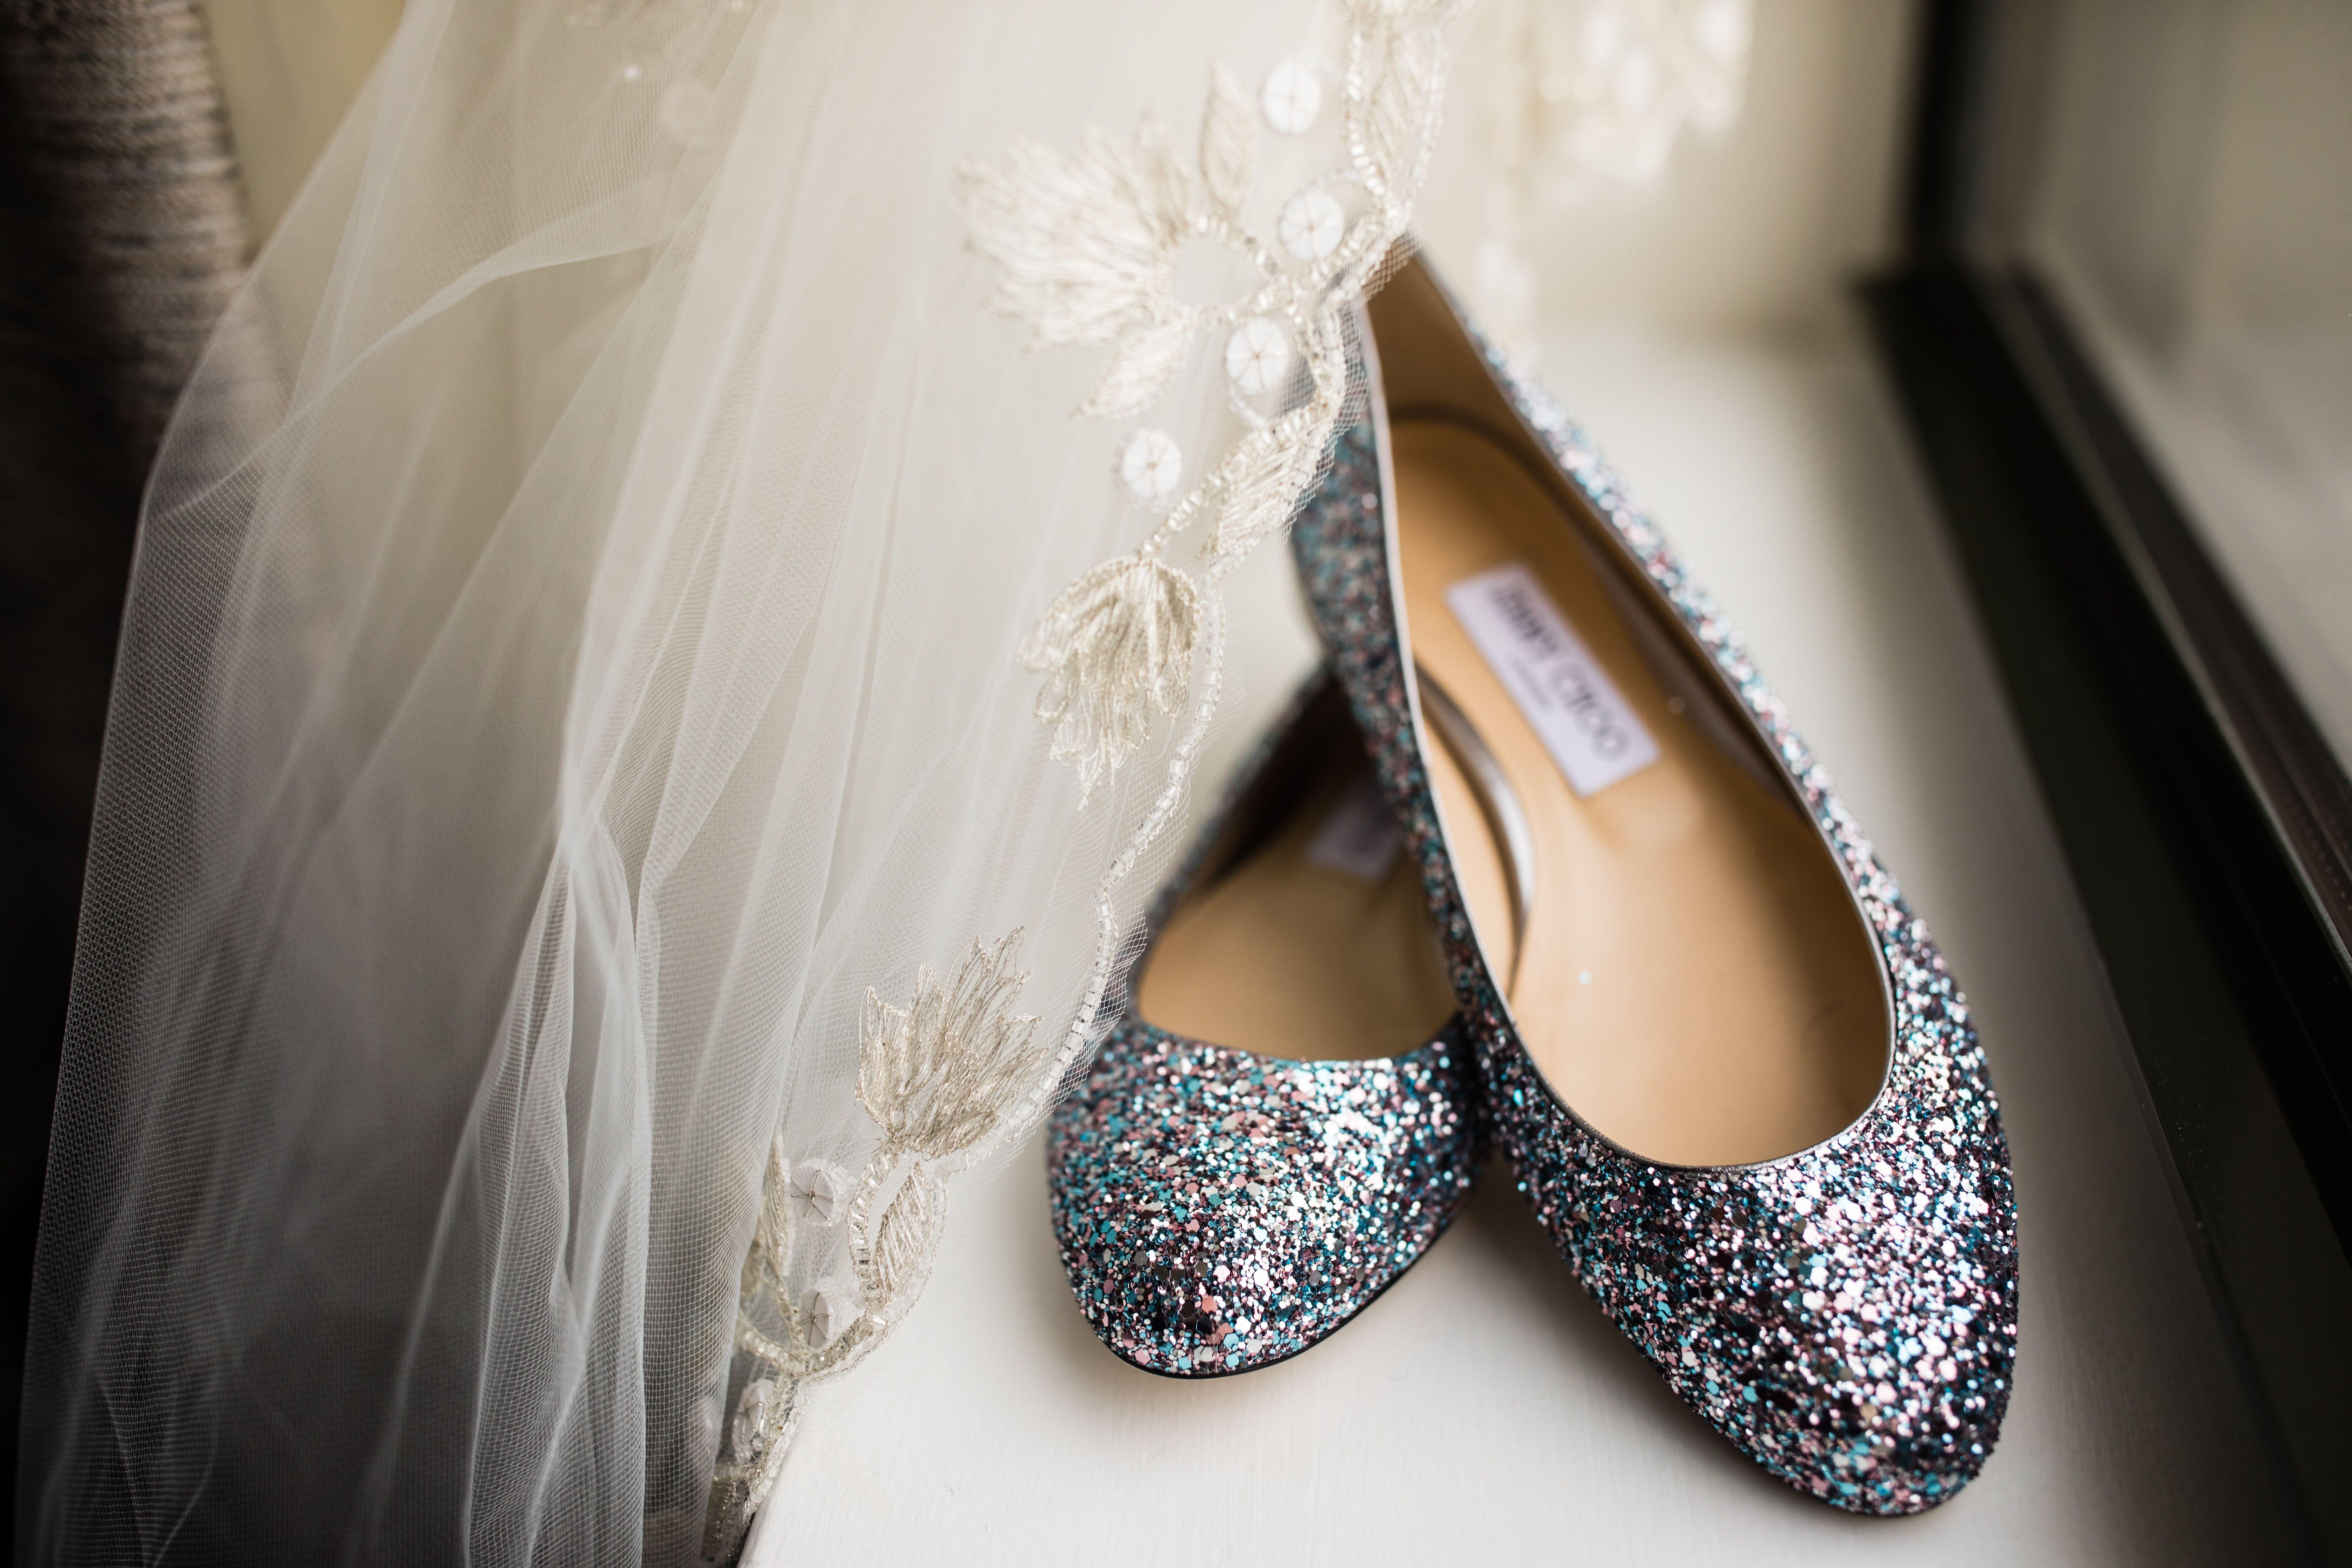 Jimmy Choo Wedding Shoes Kleinfeld Bridal Veil Idoinjimmychoo